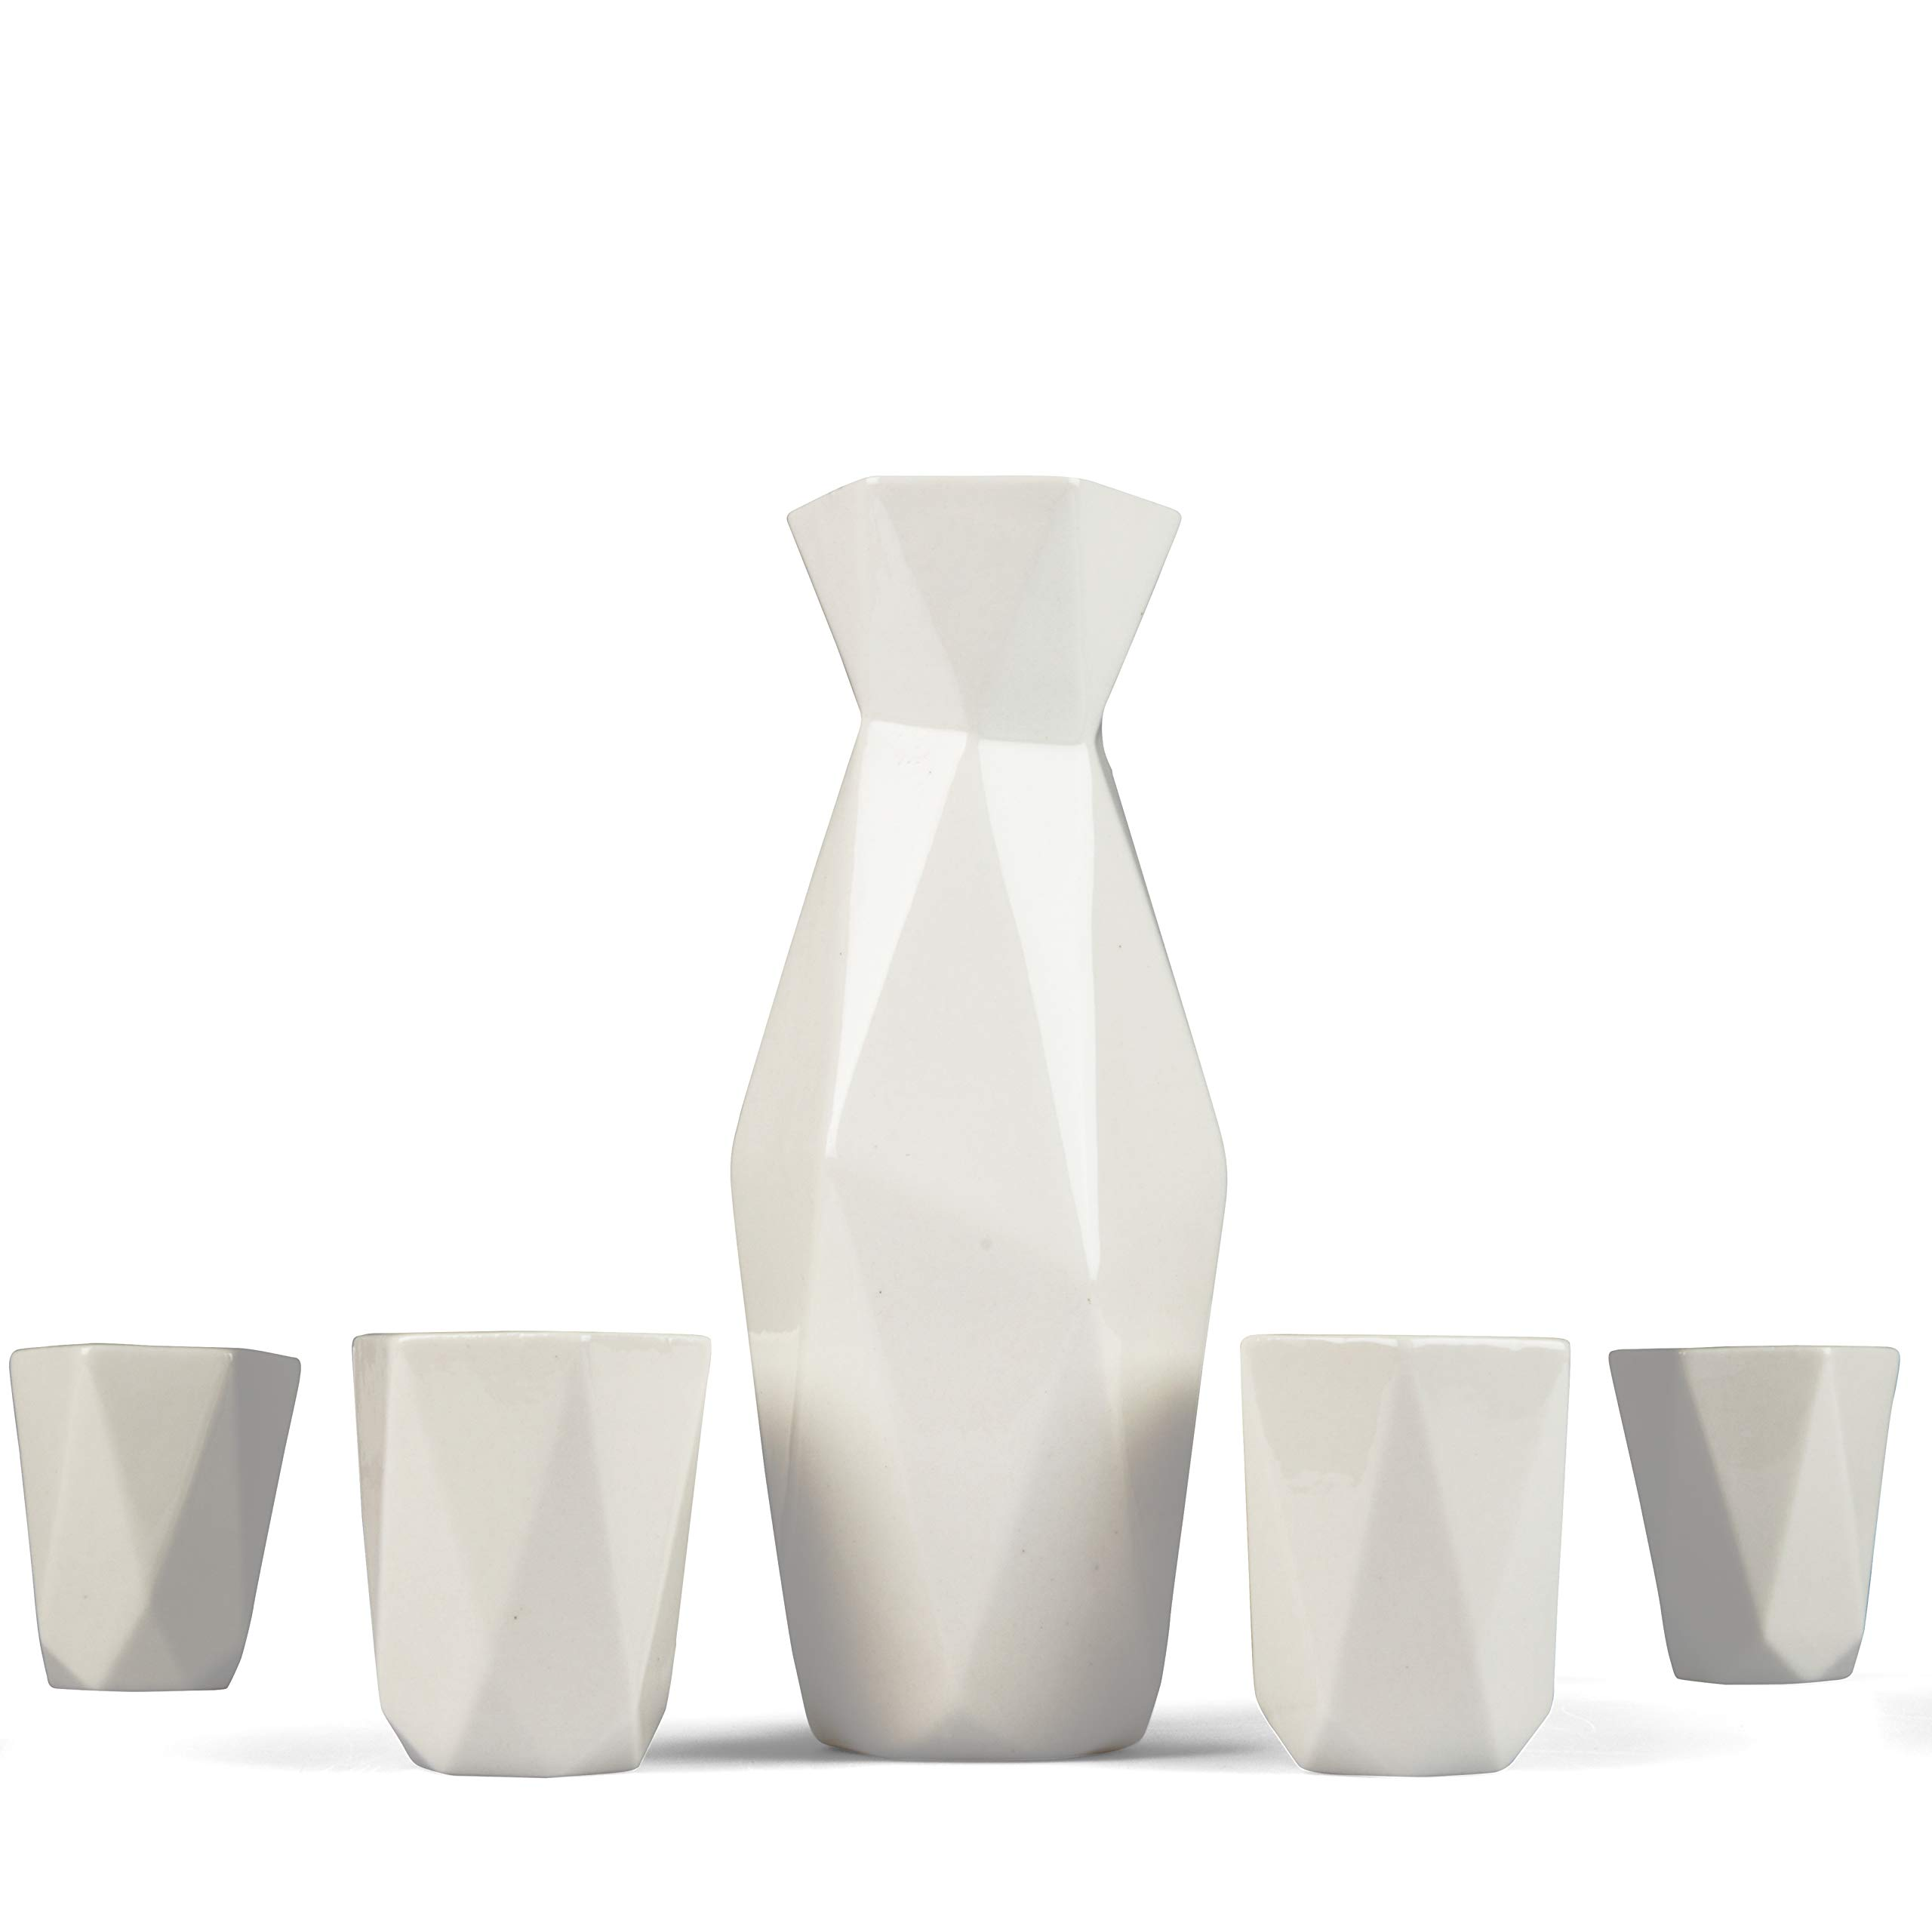 5 Piece Traditional Japanese Sake Set, 1 Tokkuri Bottle and 4 Ochko Cups, White - Unique Custom Modern Design by Deco